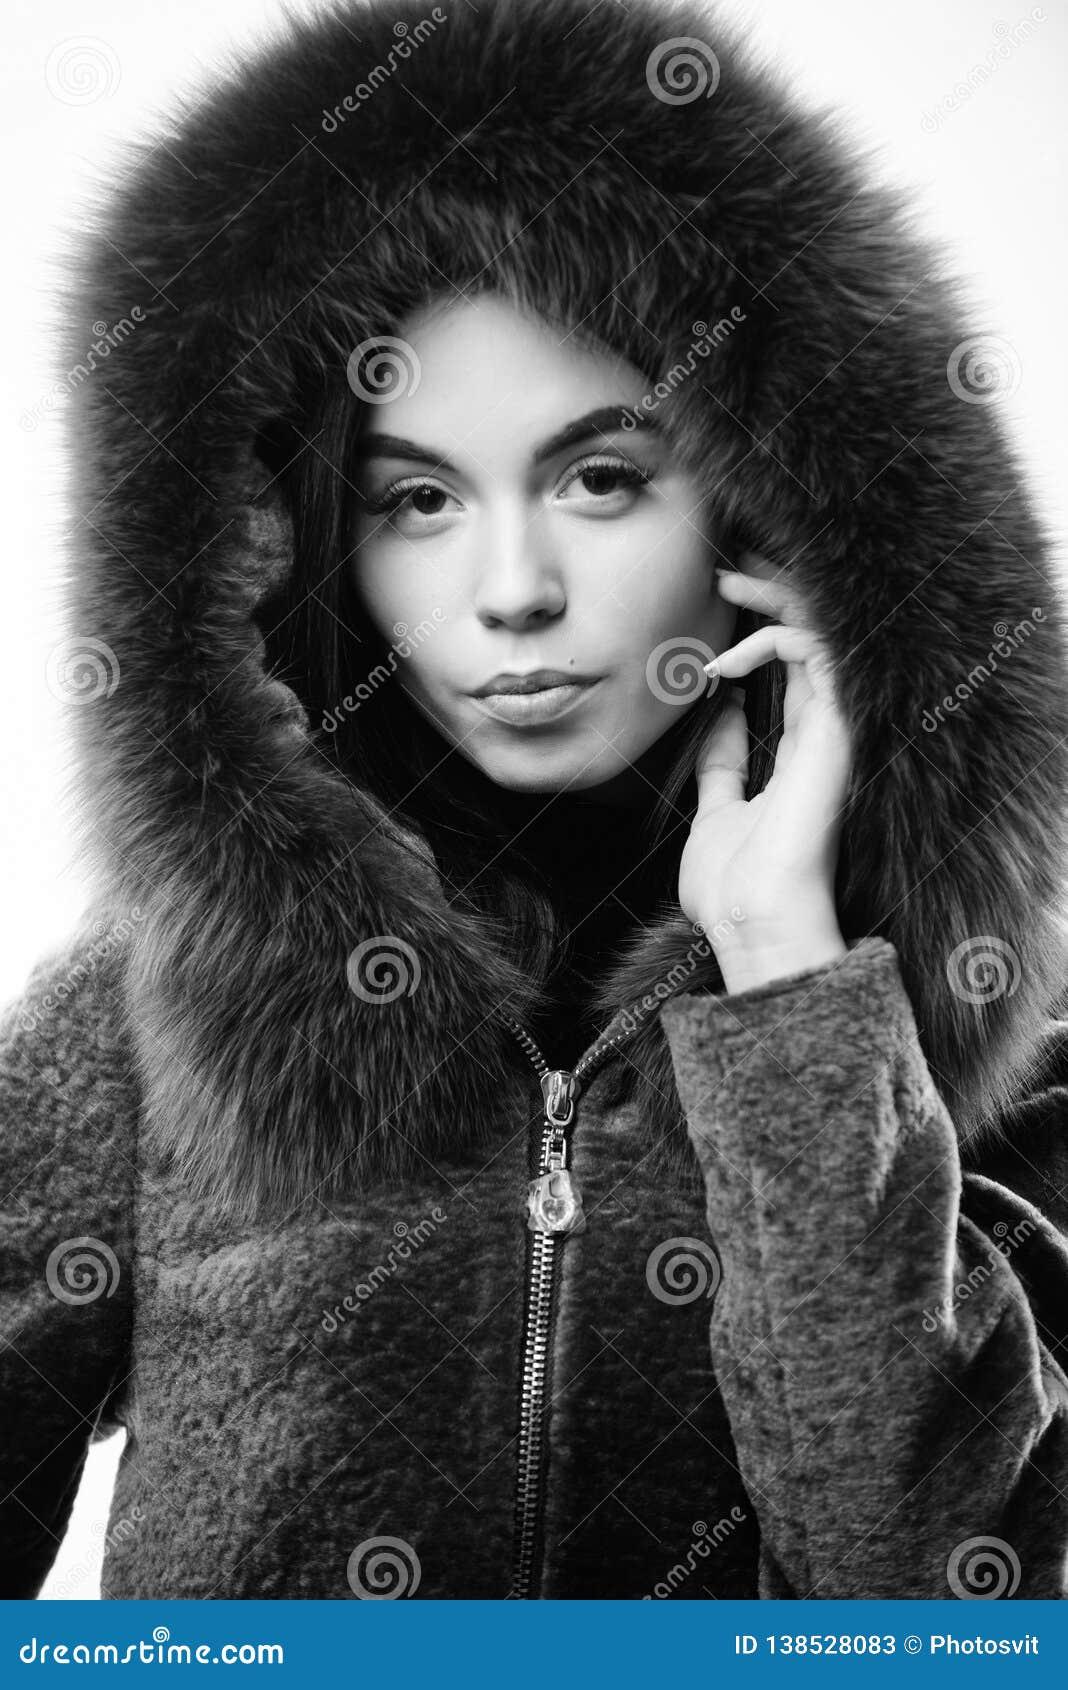 Girl posing hooded fur coat. Female with makeup wear dark blue soft fur coat. Woman wear hood with fur. Fashion concept